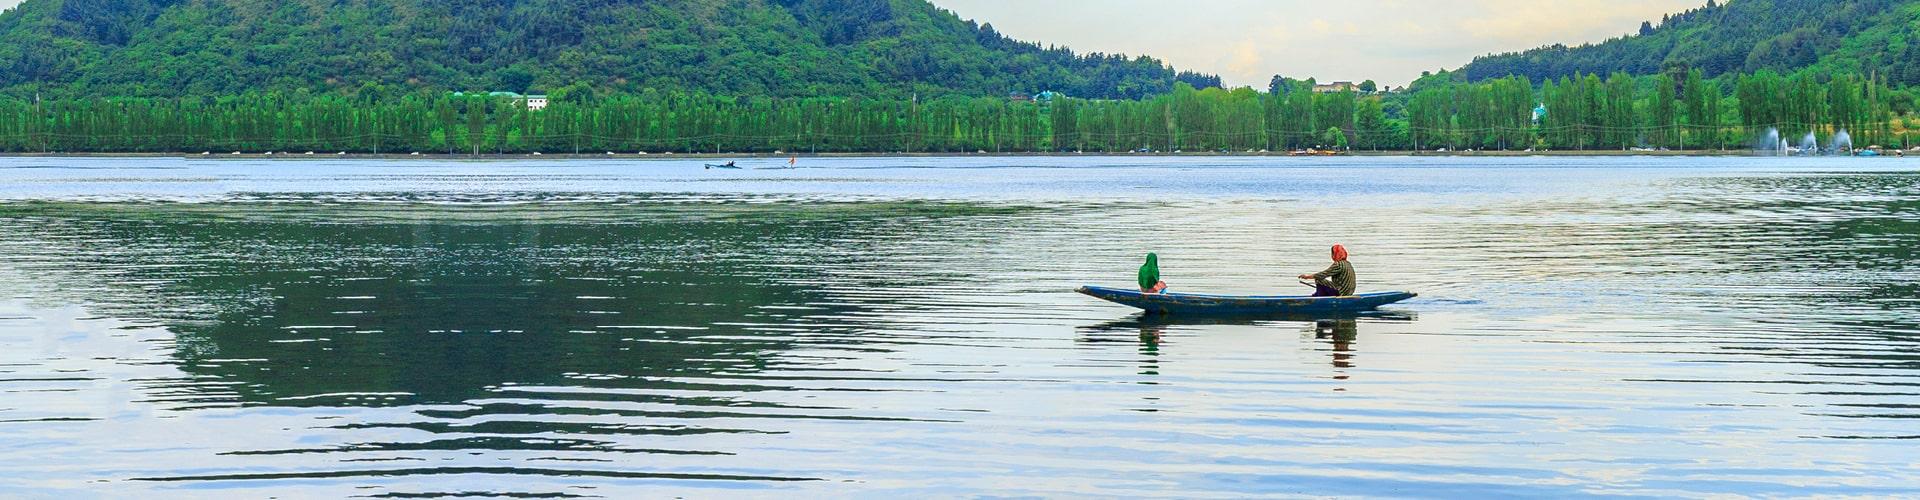 Hindu women rowing a skiff